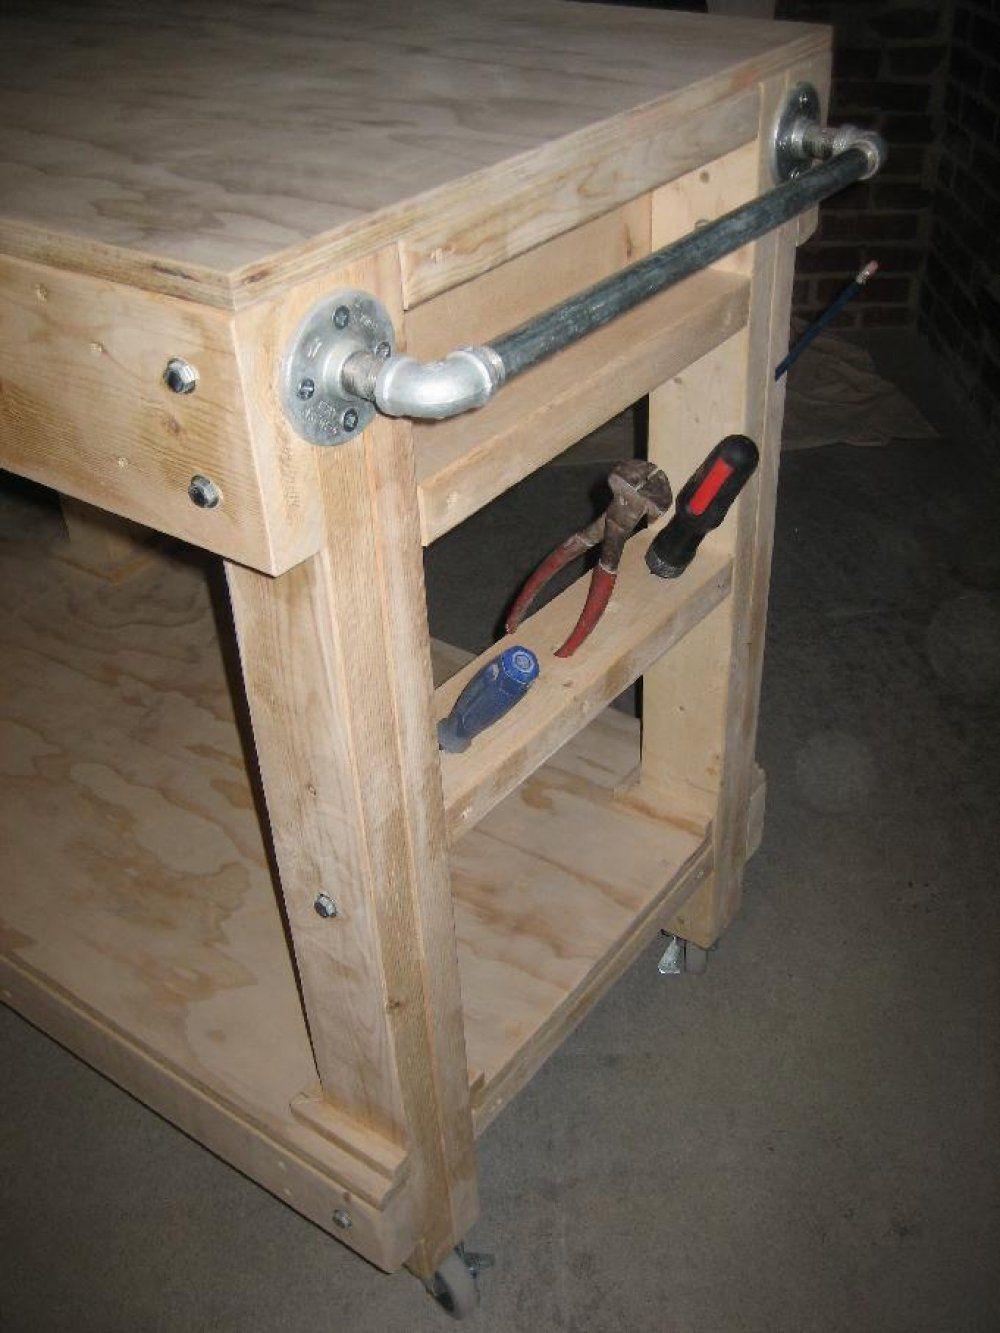 Heres A DIY Portable Garage Workbench On Wheels